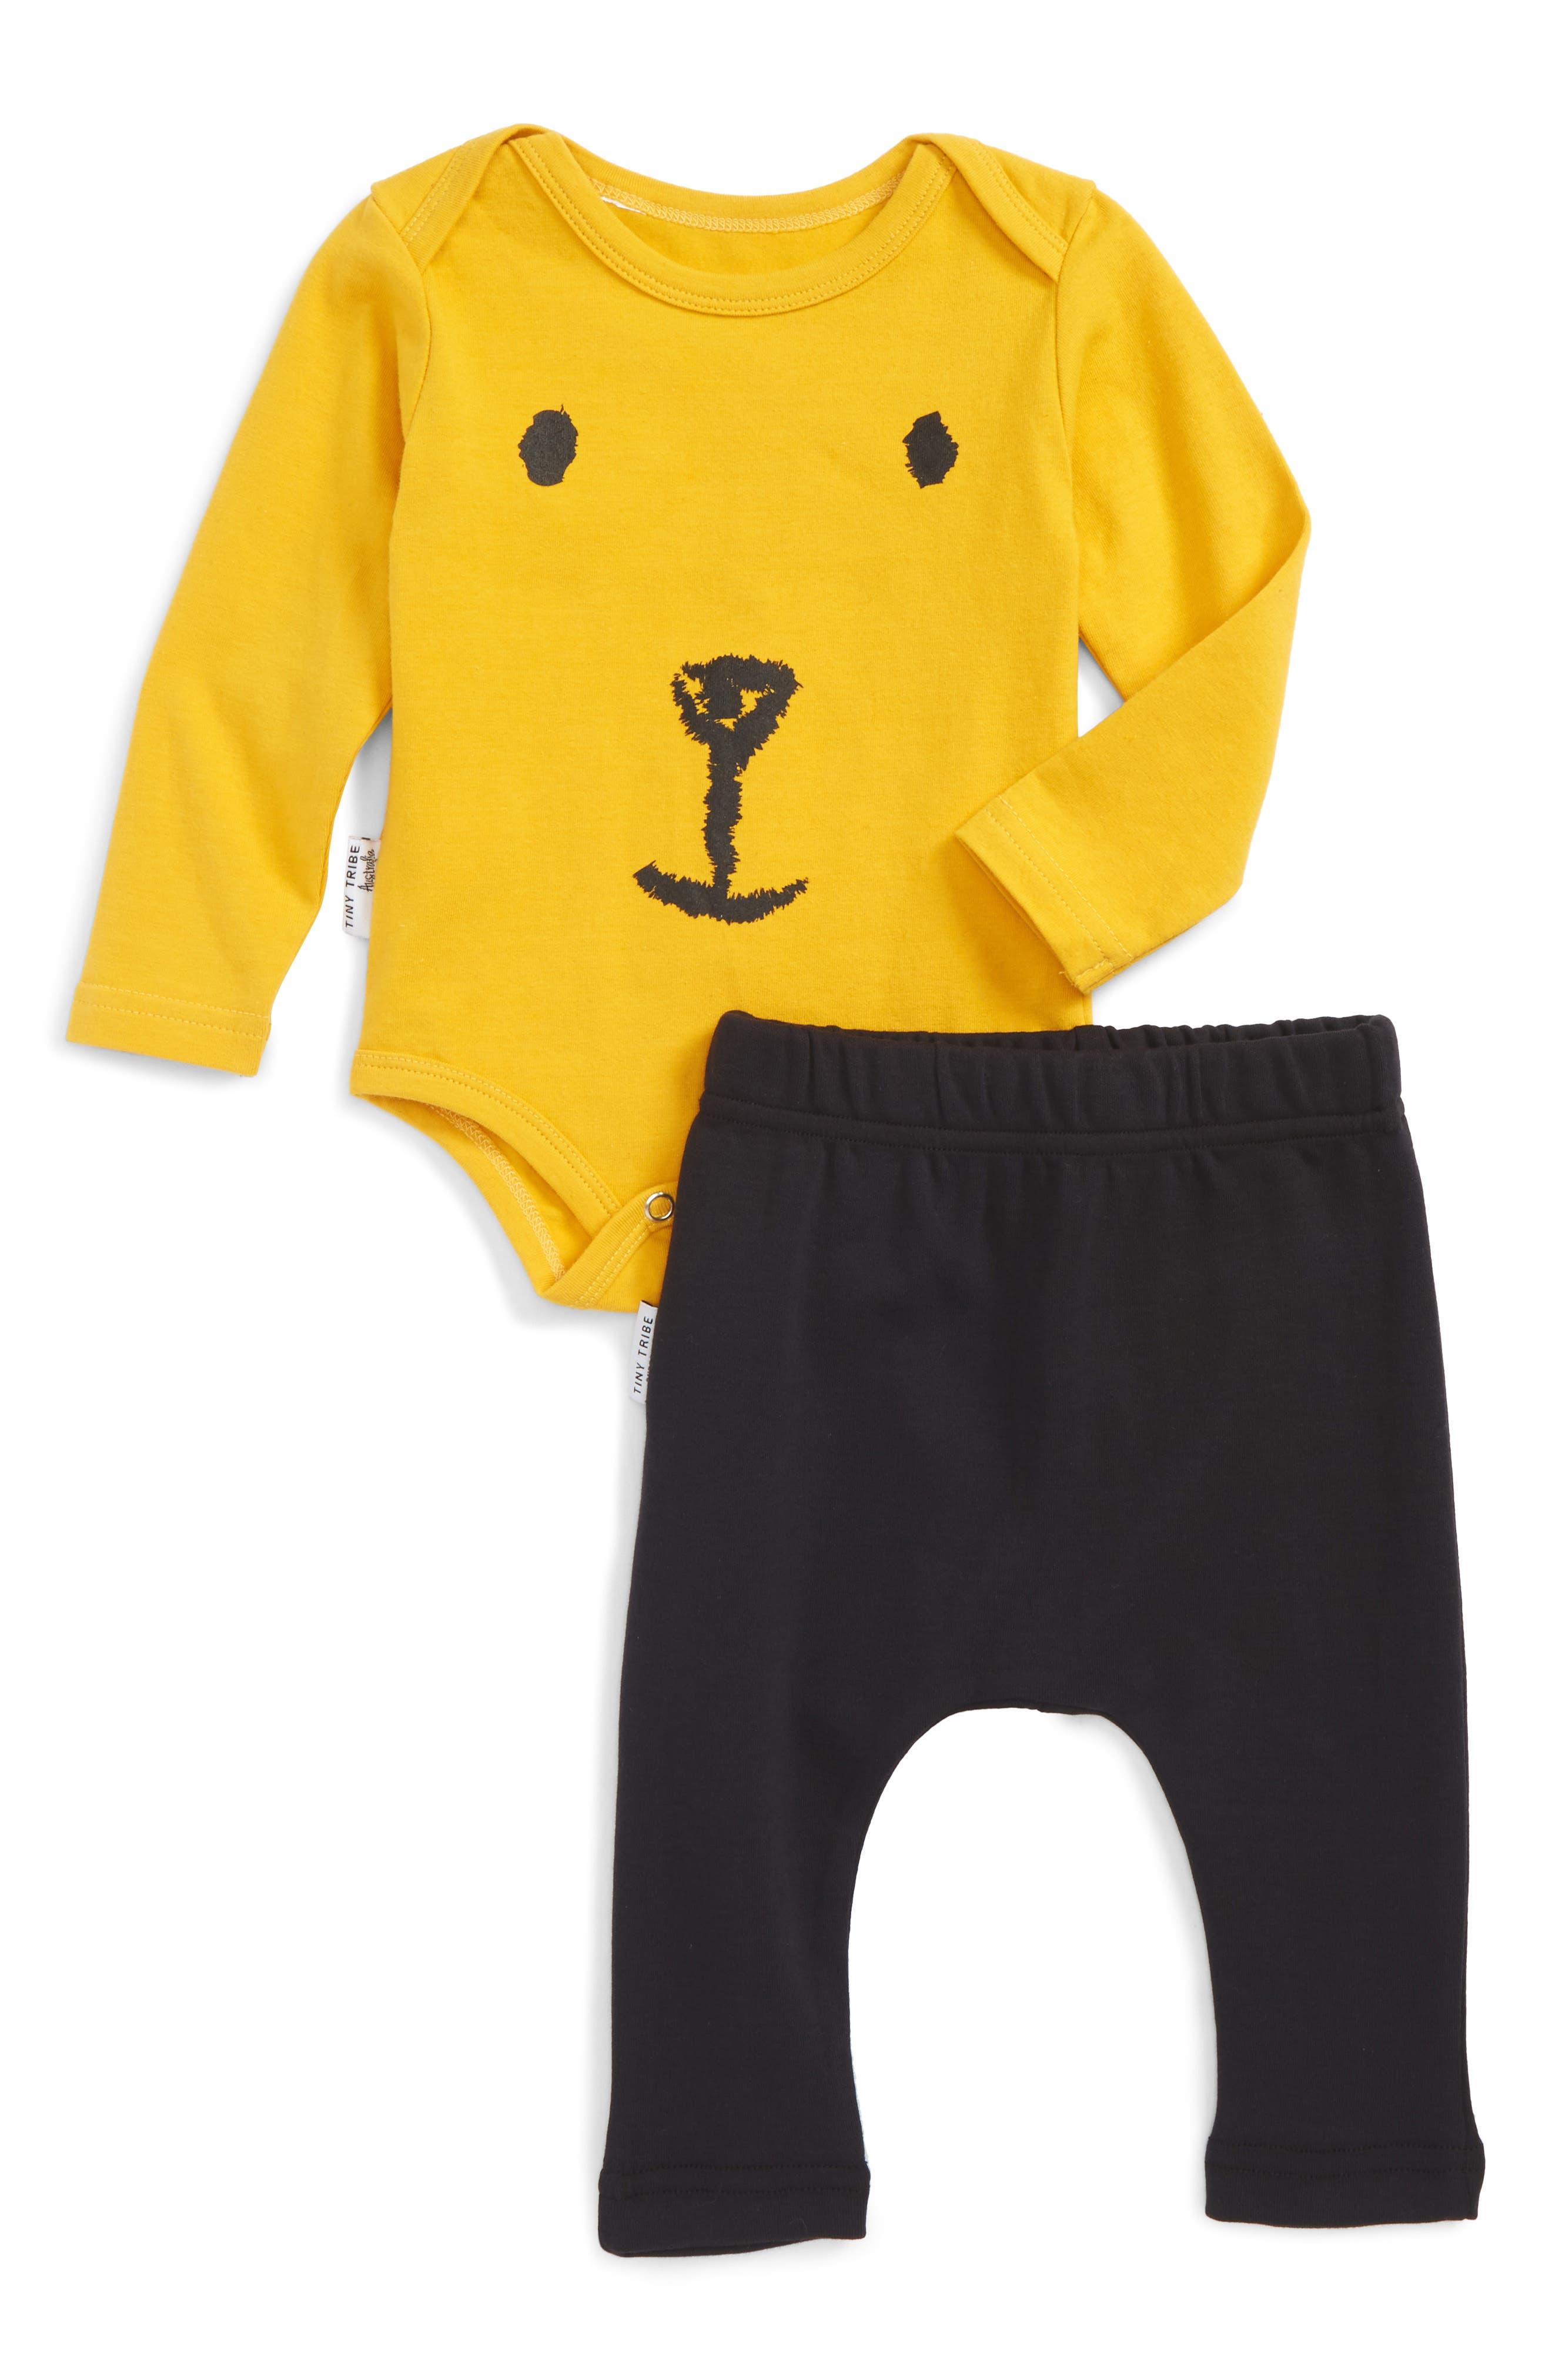 Main Image - Tiny Tribe Honey Bear Bodysuit & Track Pants Set (Baby)